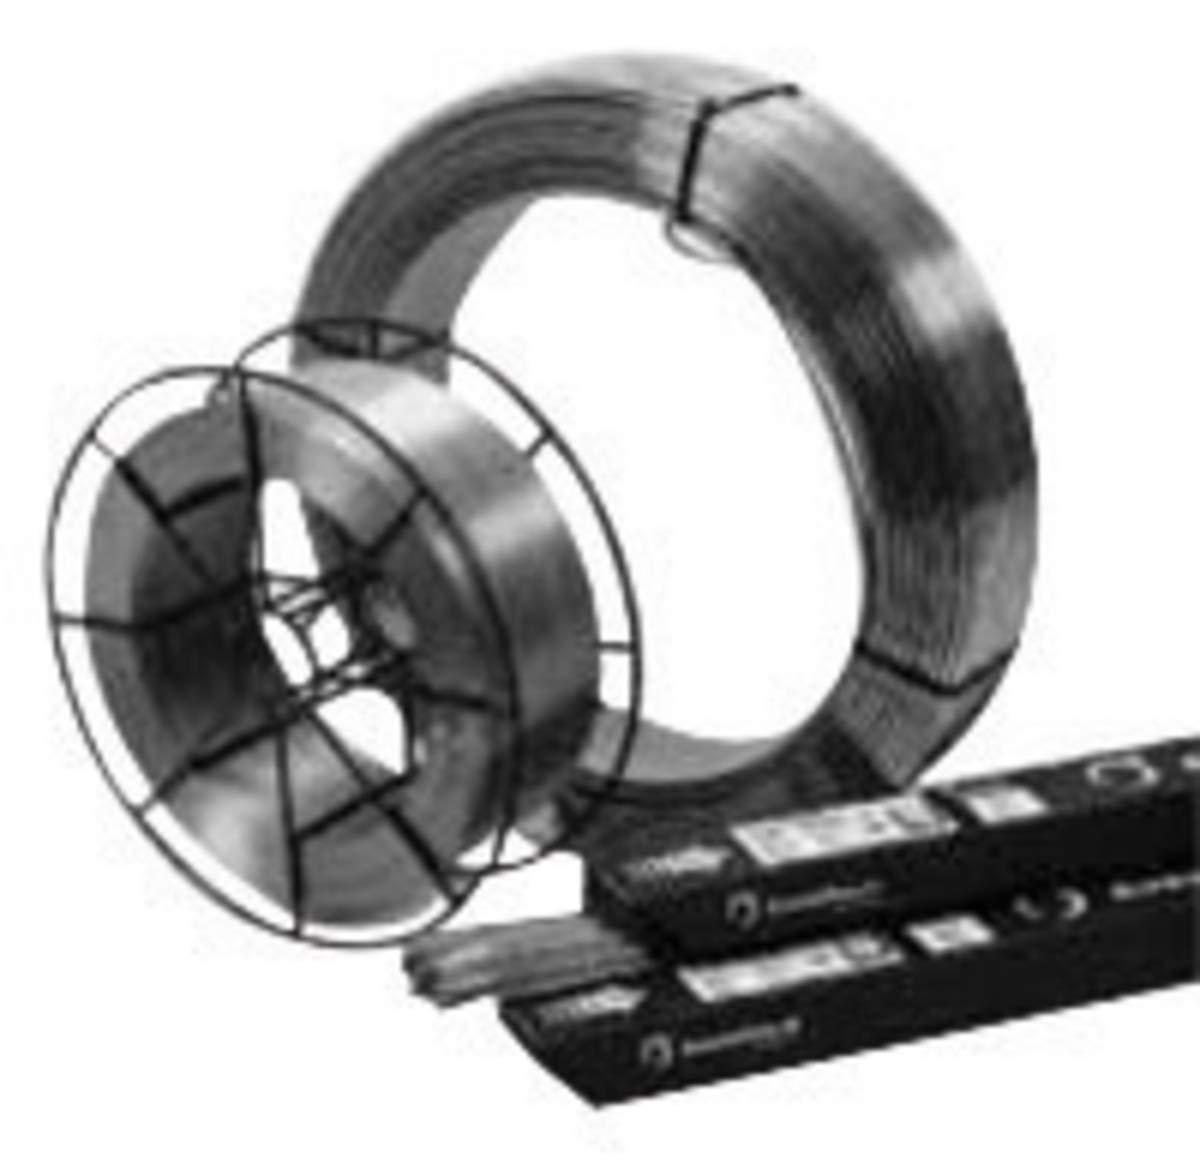 .035'' ER309L voestalpine Bhler Welding Avesta 309L Stainless Steel MIG Wire 2 Spool, Package Size: 2 US pound